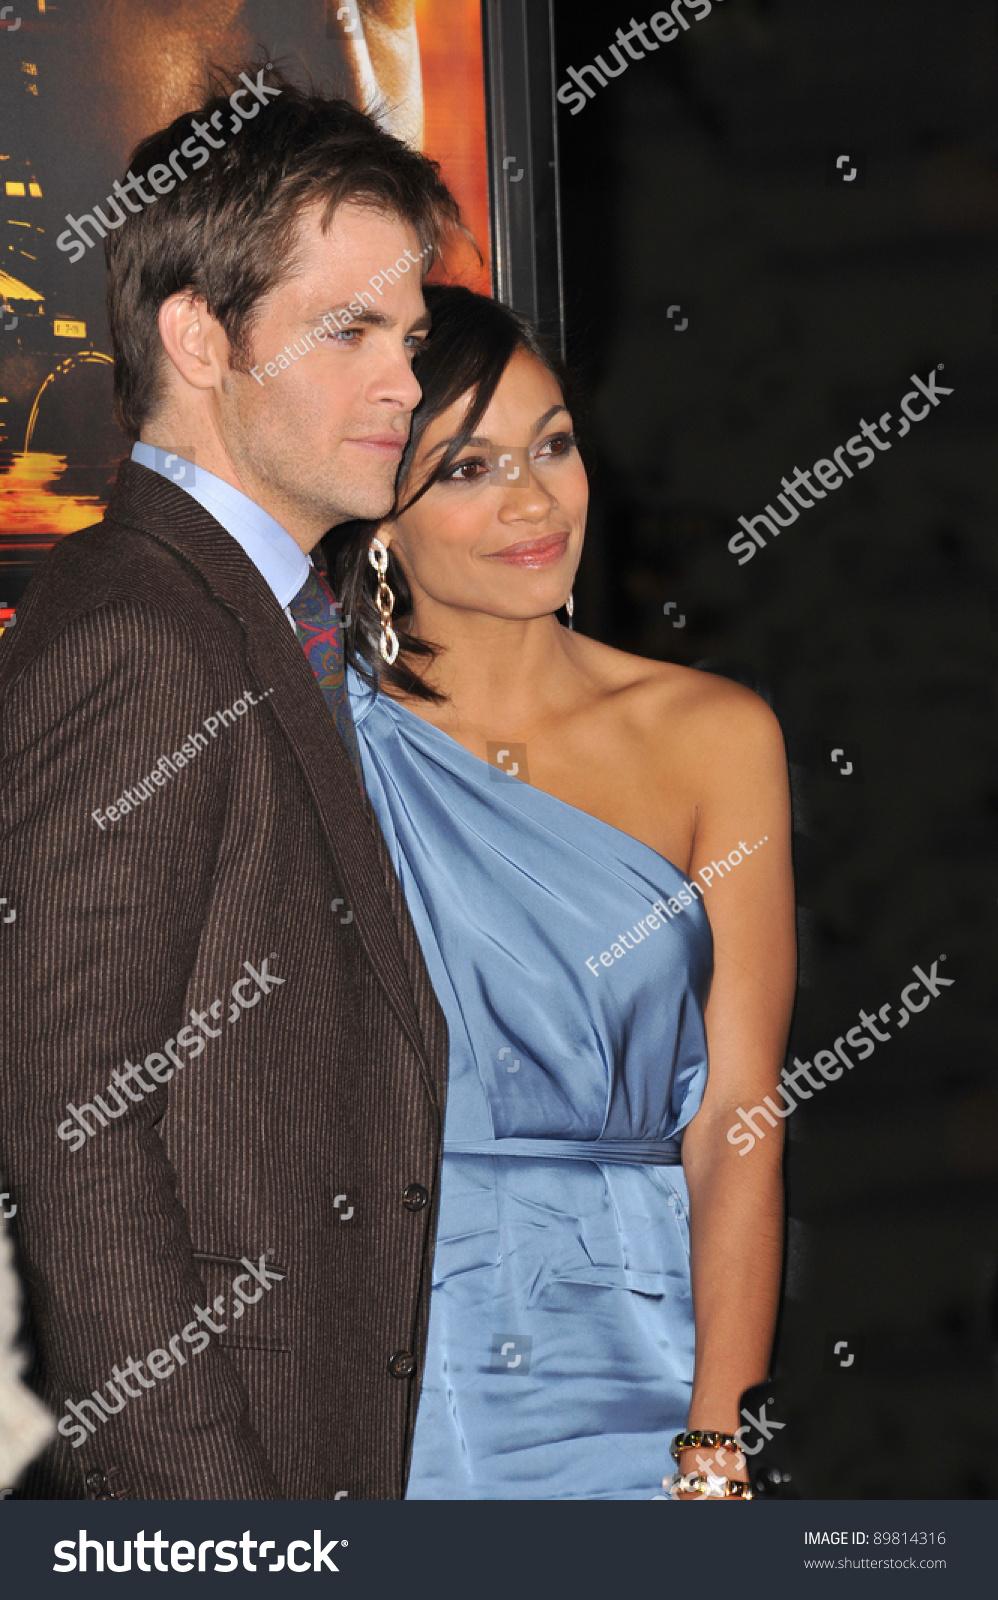 Rosario dawson dating 2010